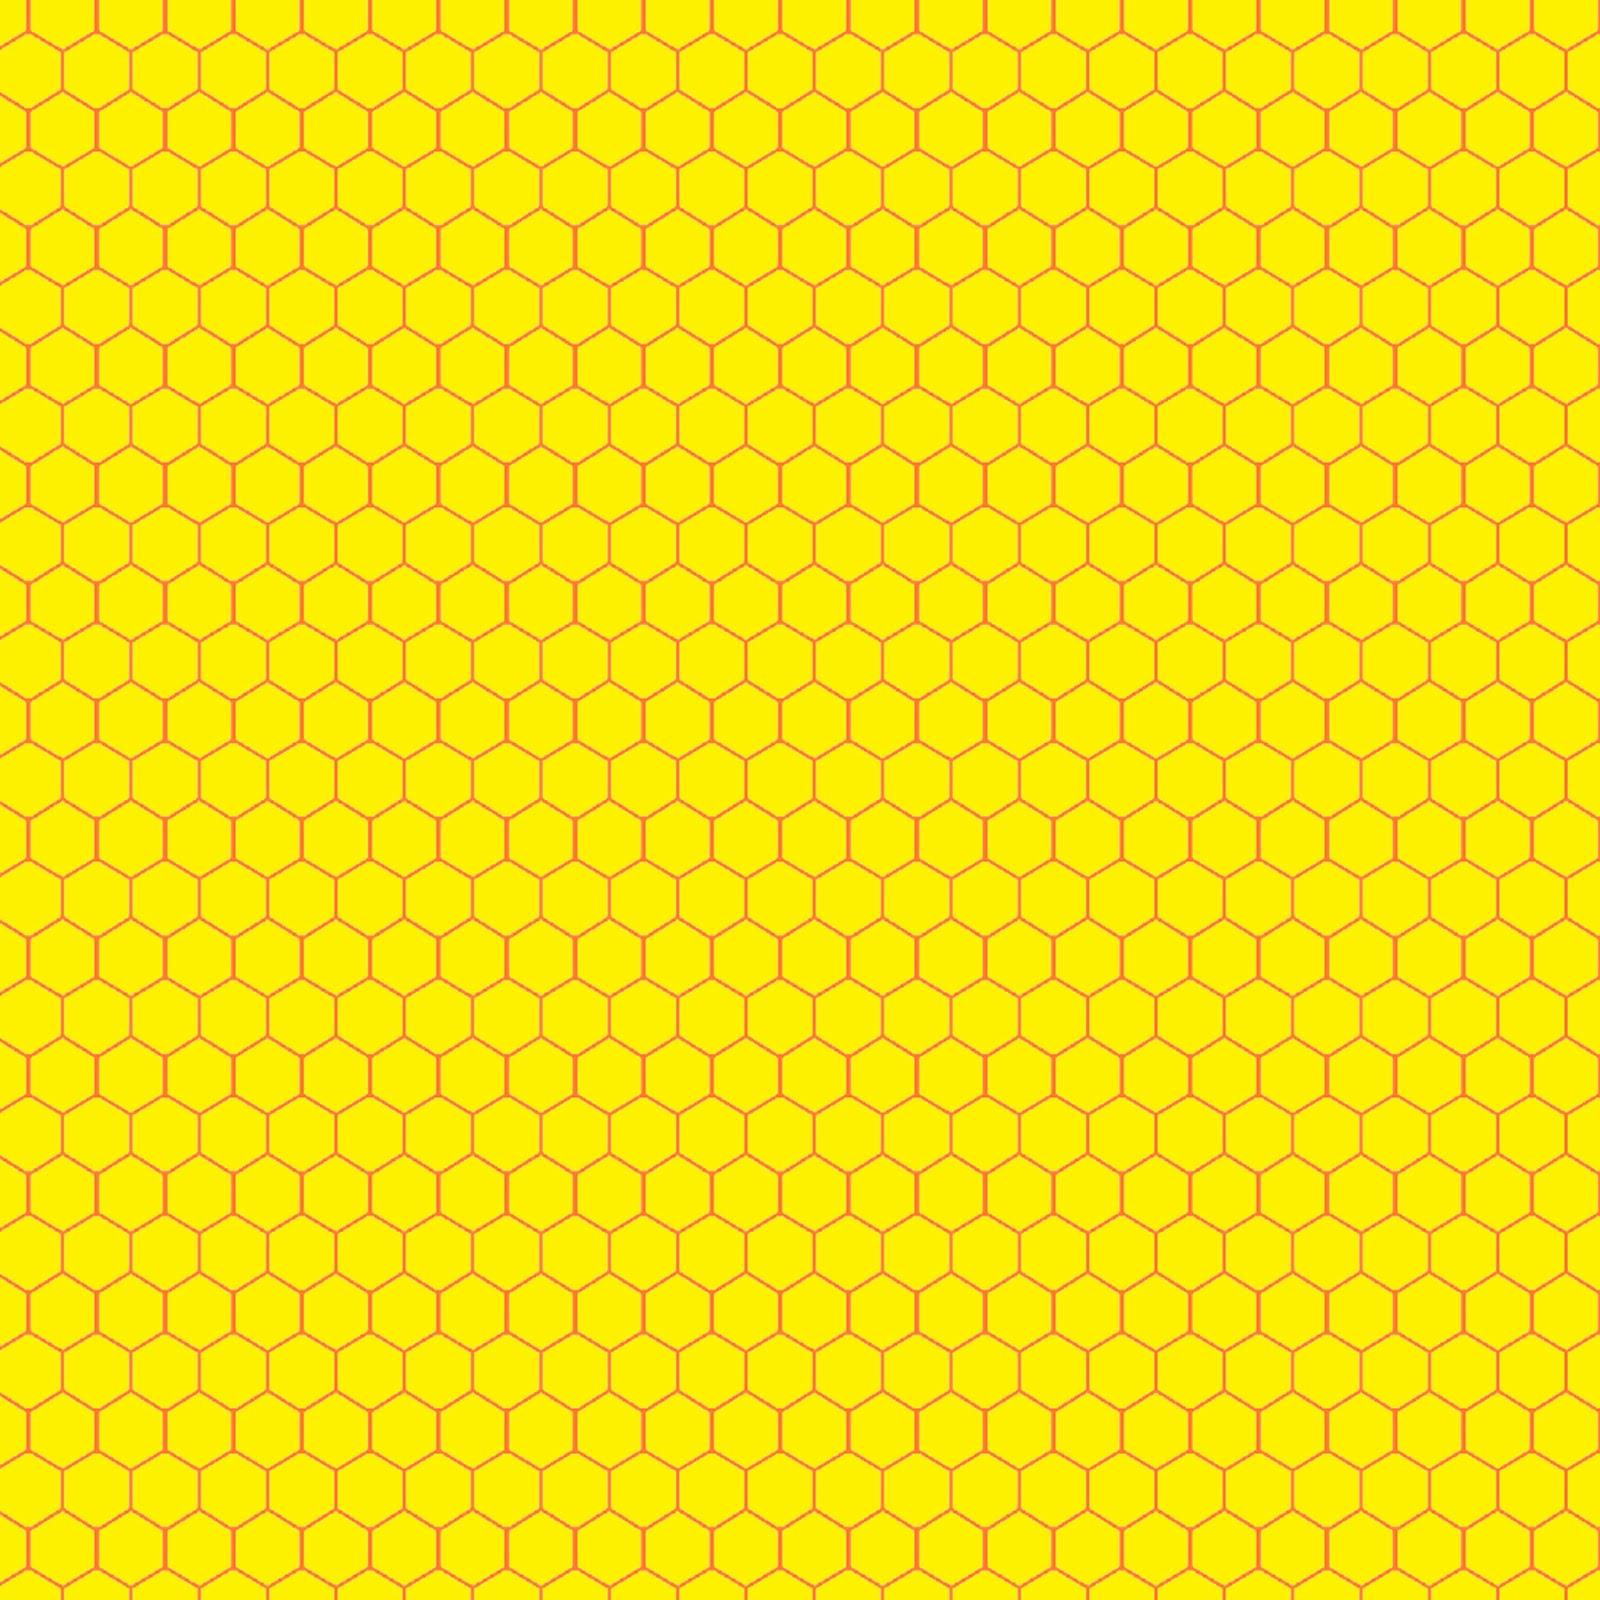 Neon Yellow Background - WallpaperSafari - 409.4KB